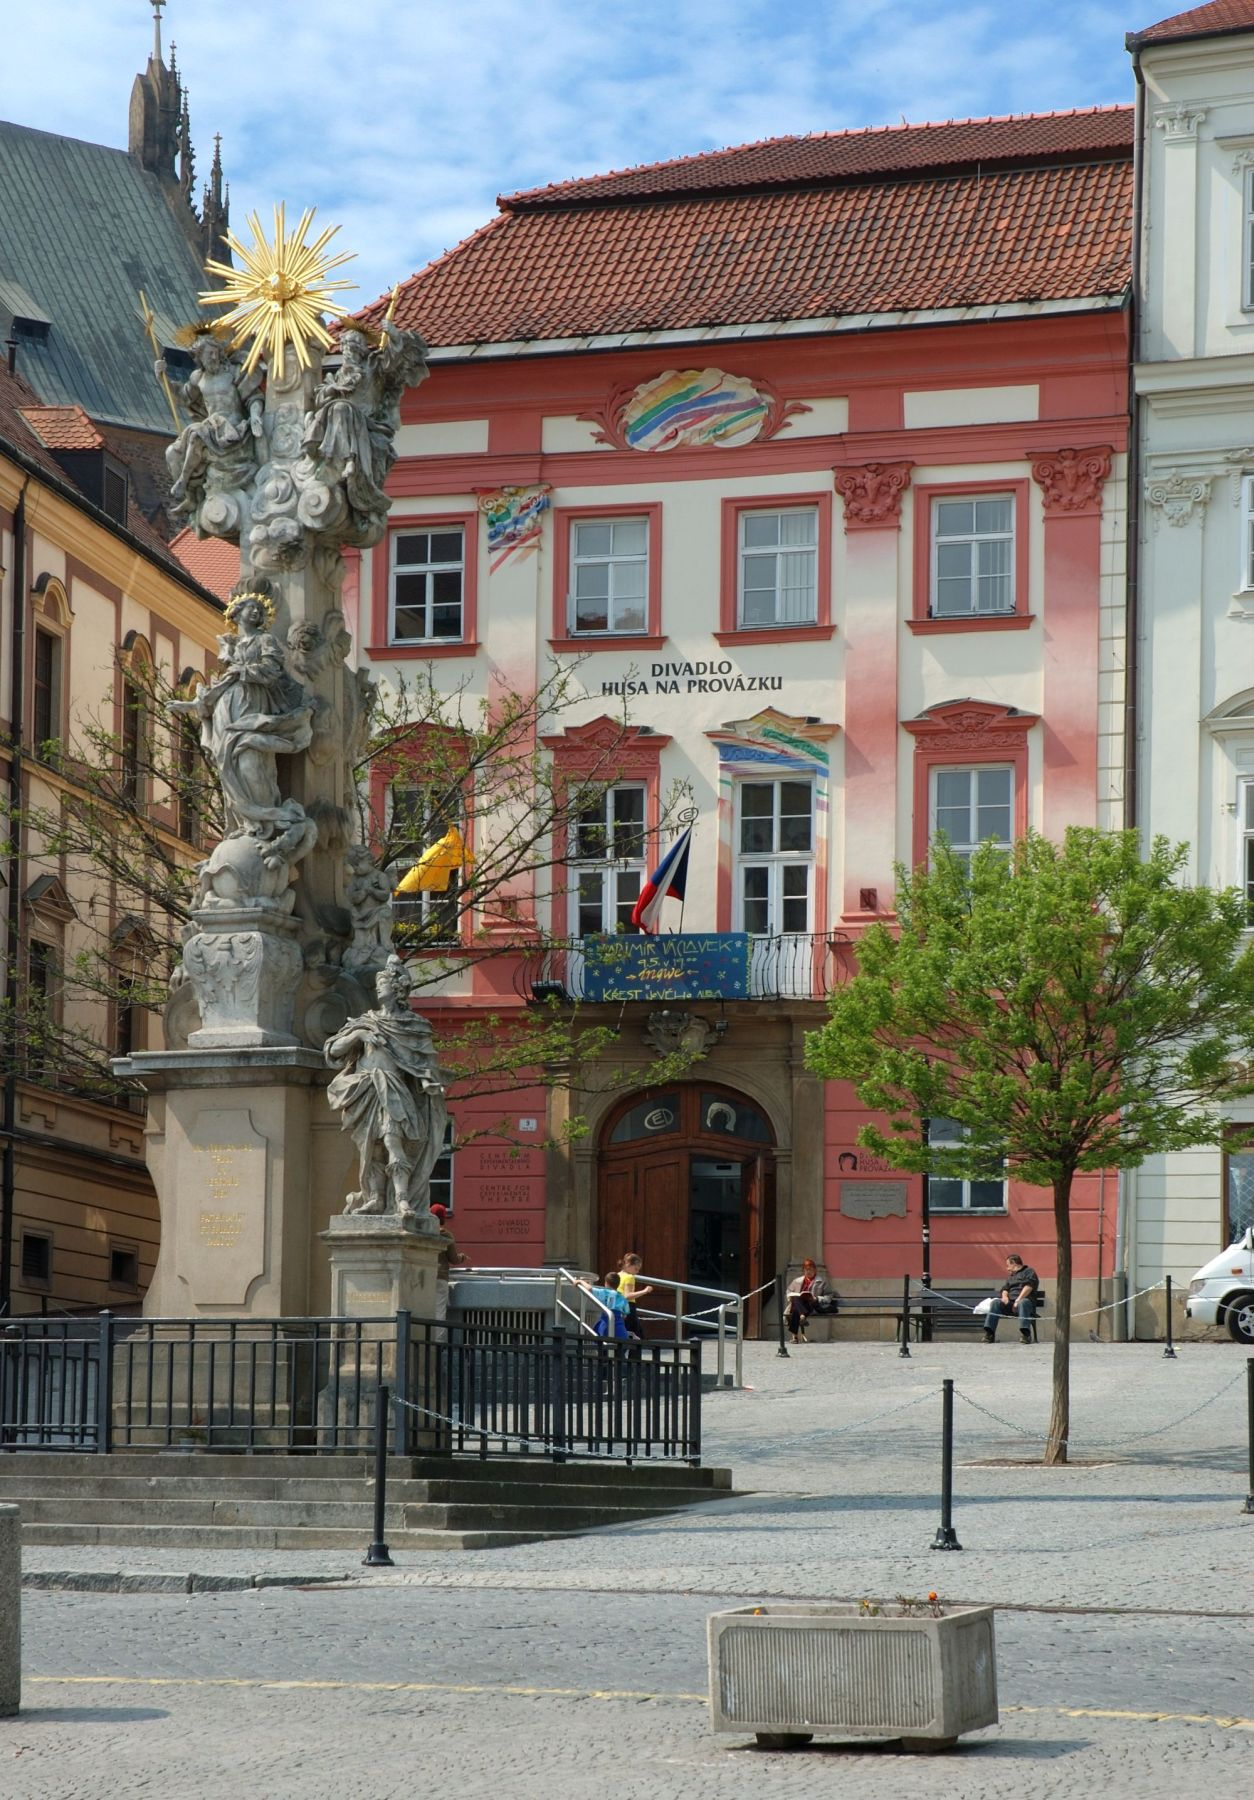 Goose on a String Theatre (Divadlo Husa na provázku) in Brno